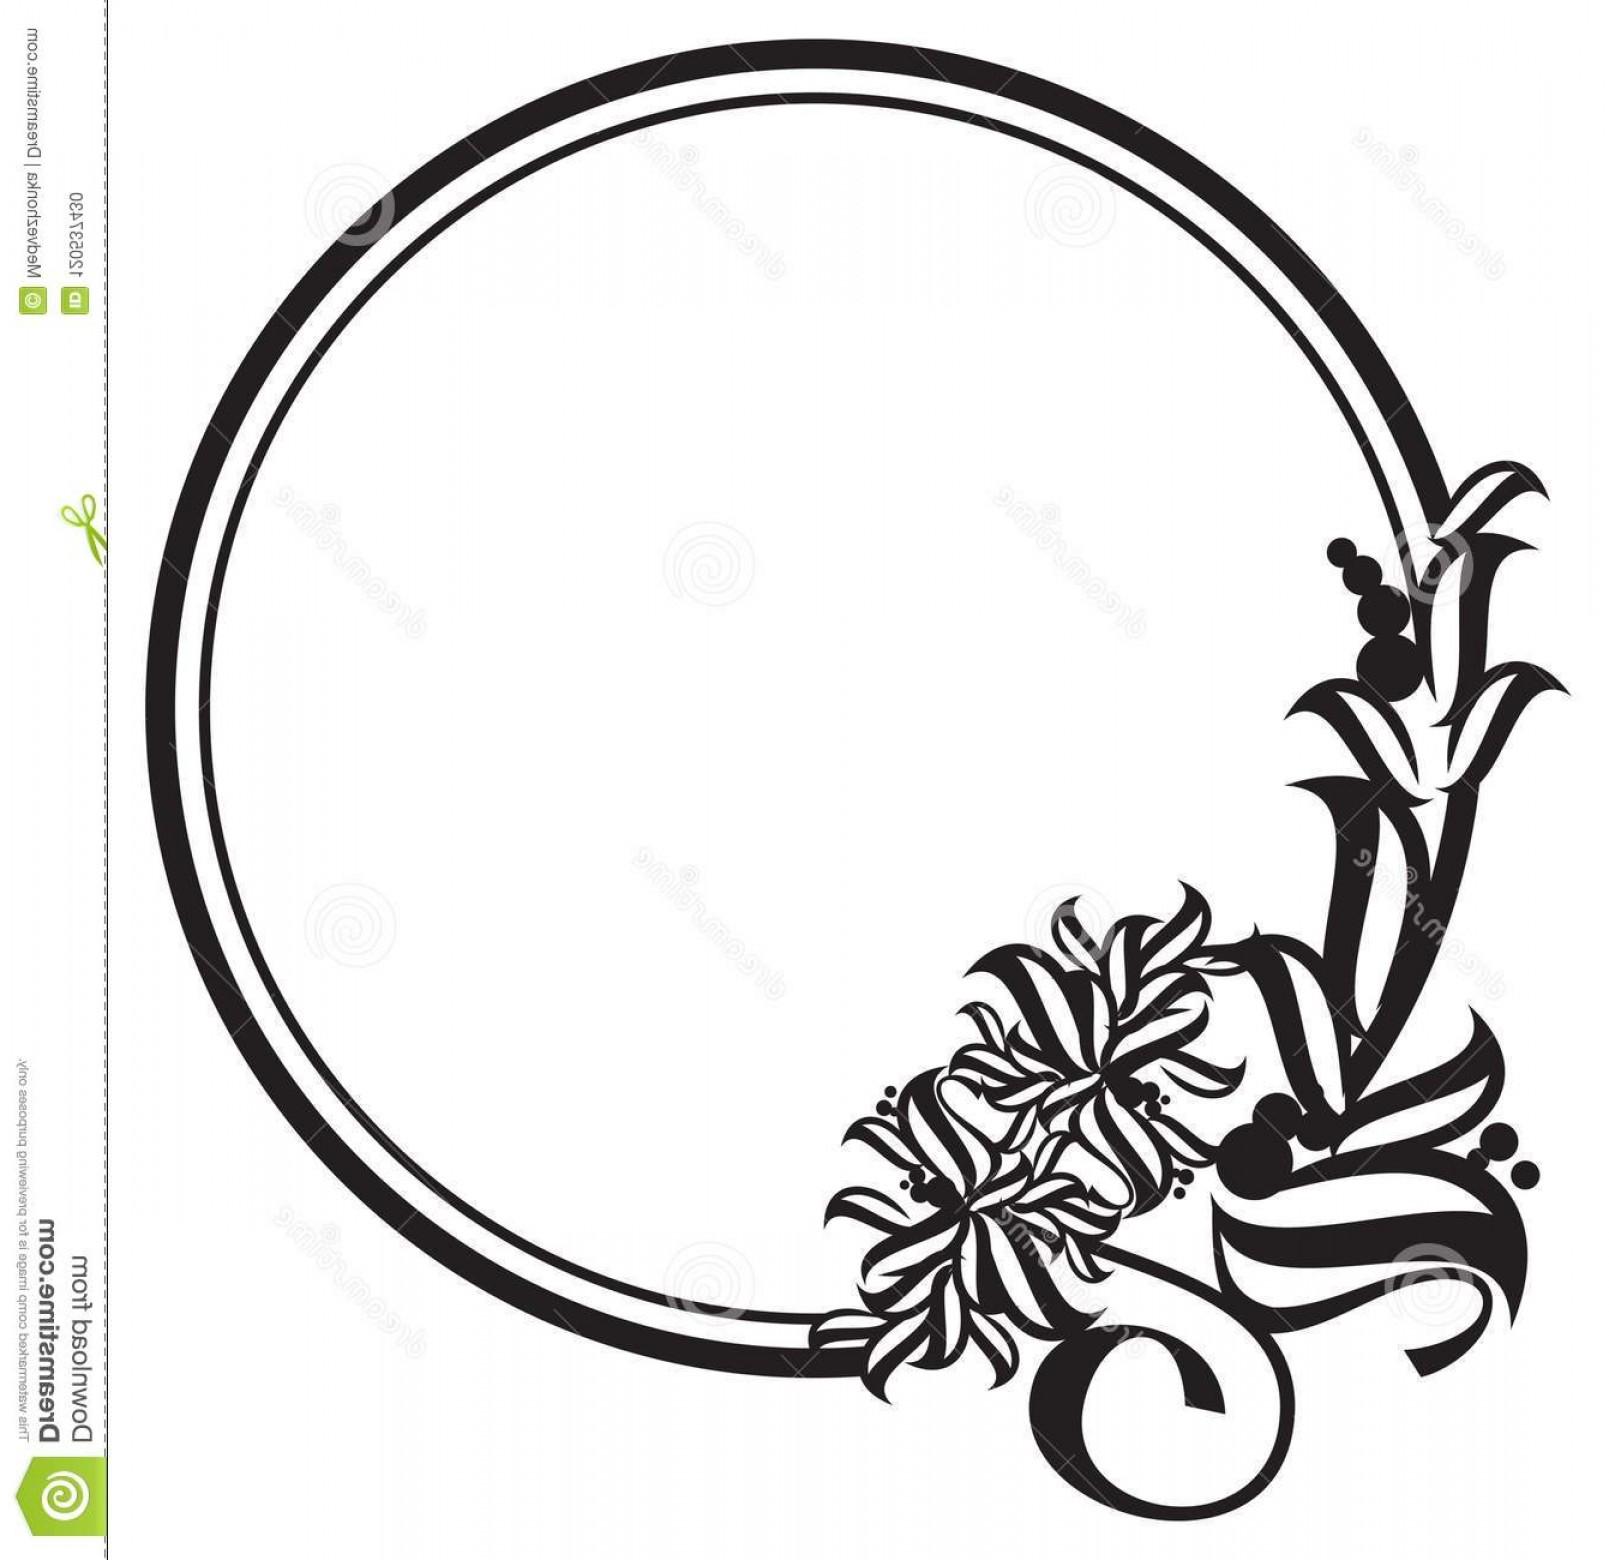 1609x1560 Round Vector Clip Art Soidergi